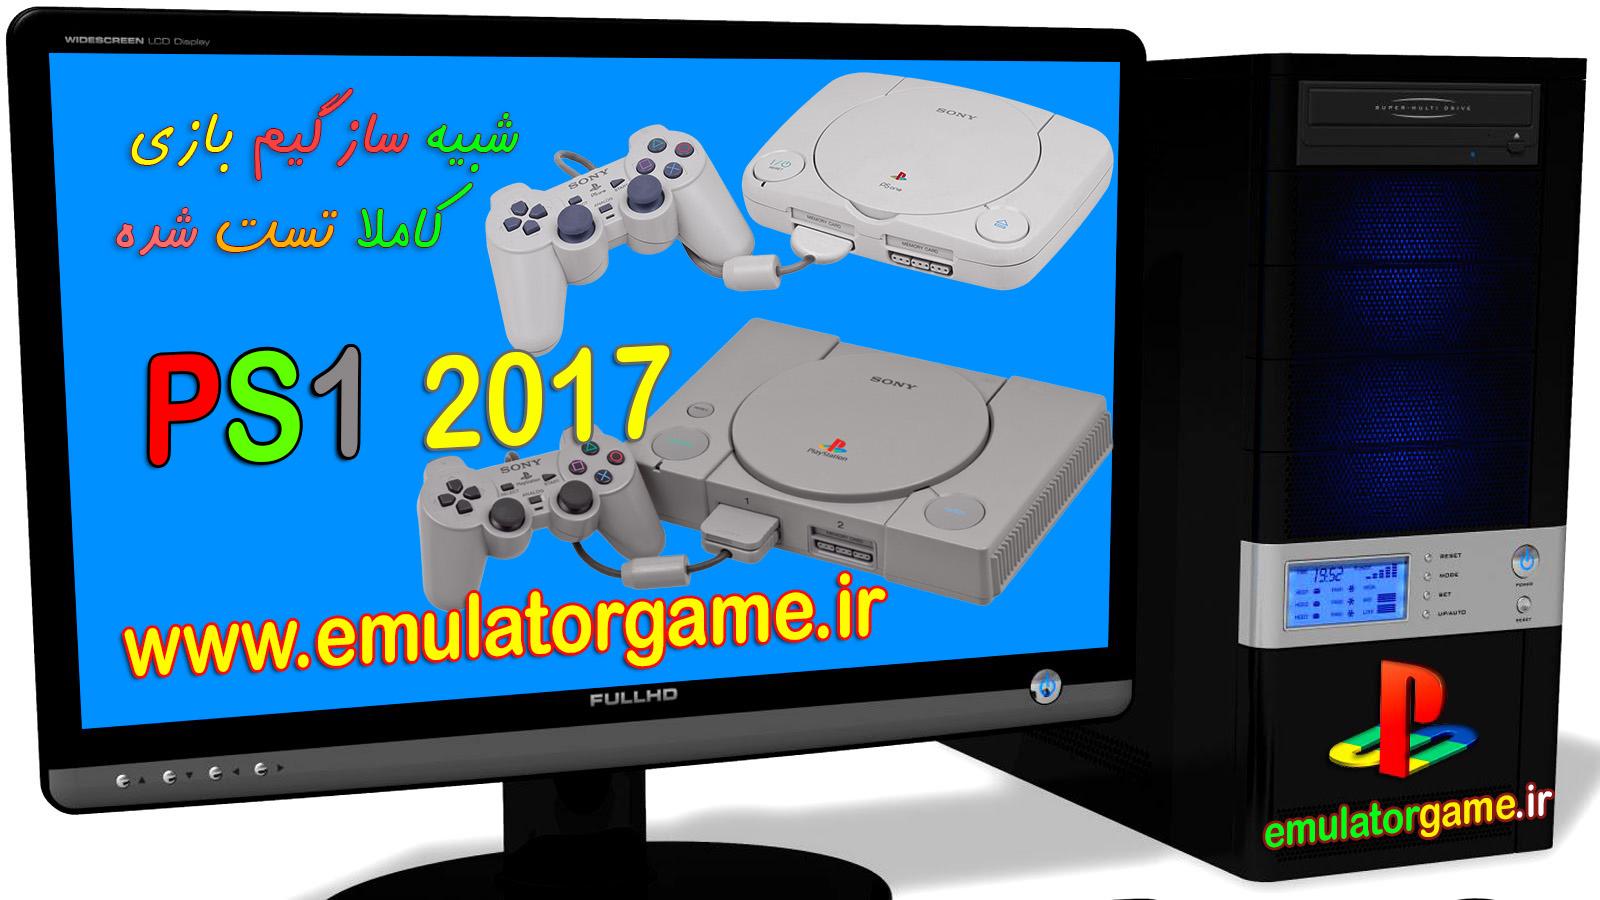 PS1. 2017